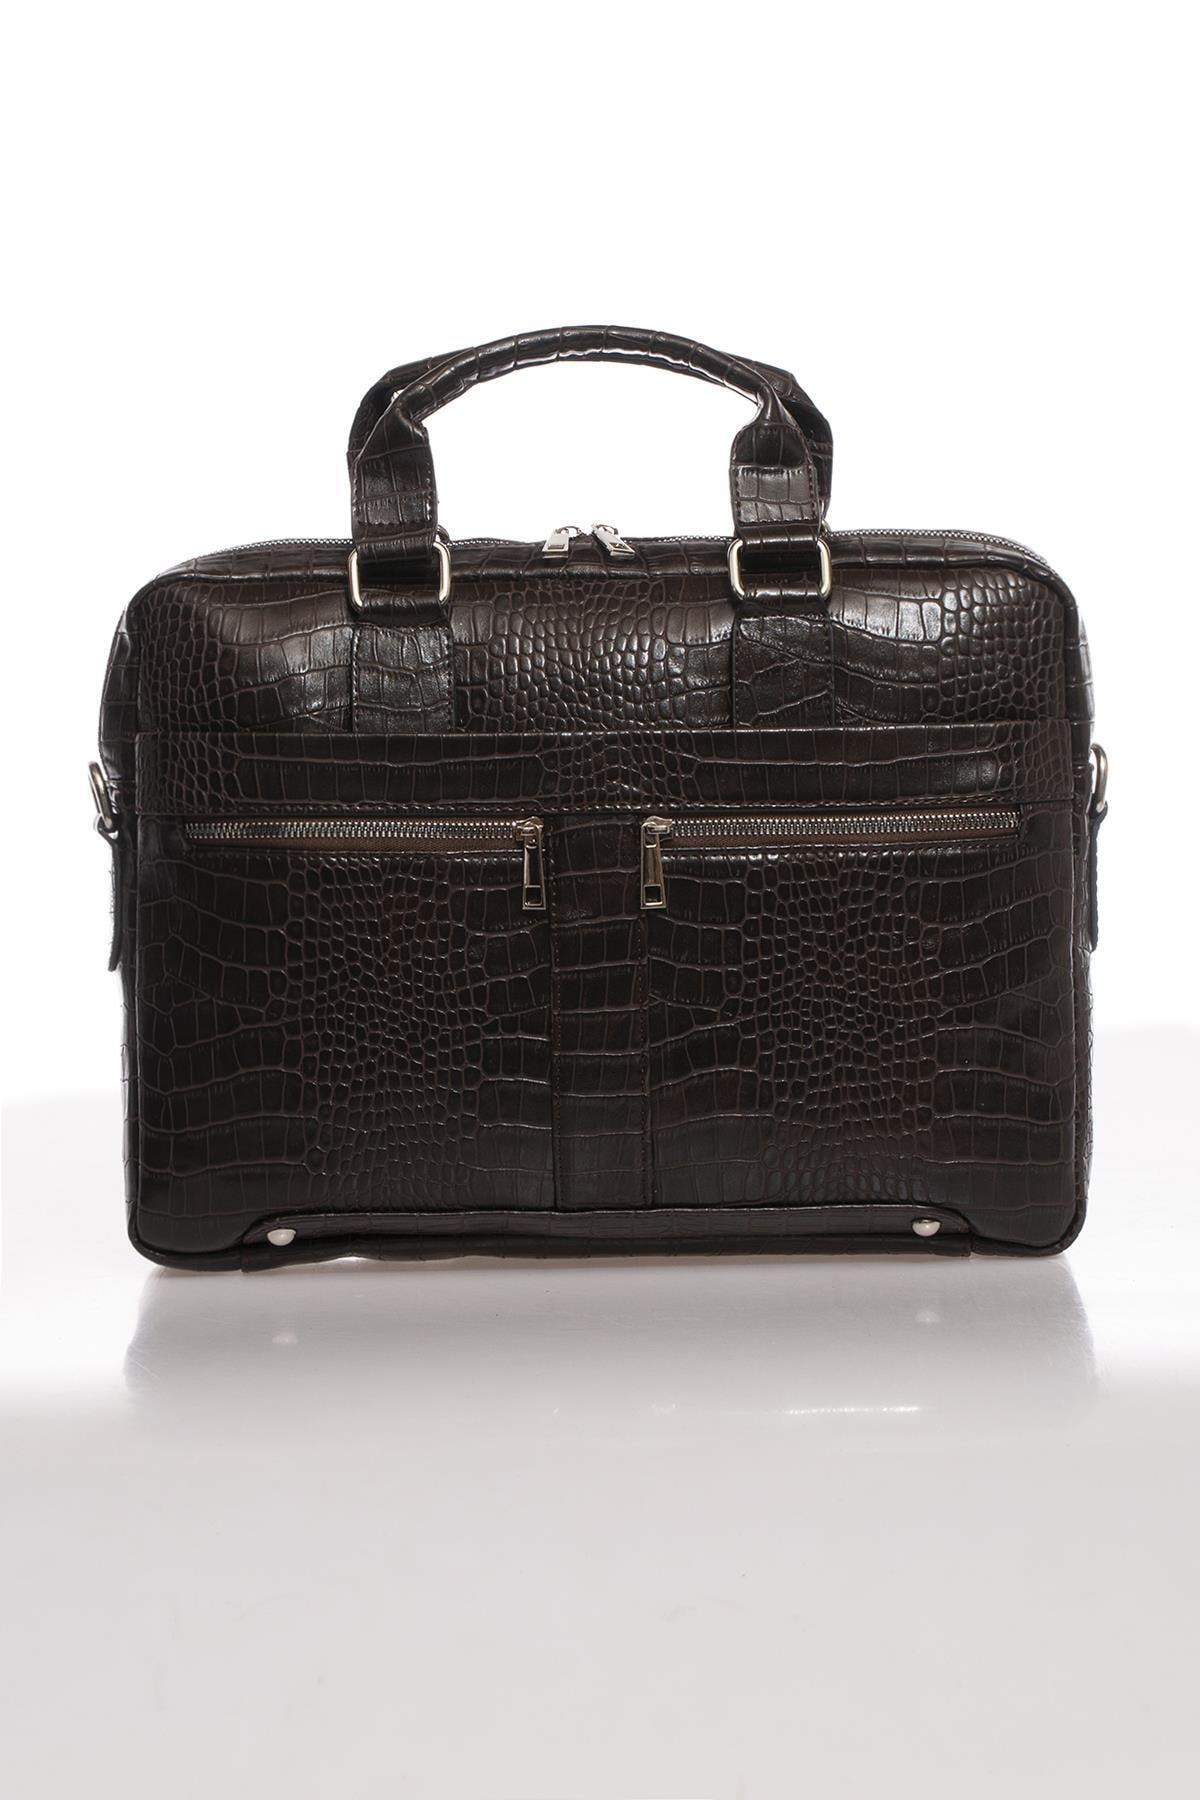 Sergio Giorgianni Luxury Mpist9141 Kroko Kahverengi Unısex Evrak Çantası 1